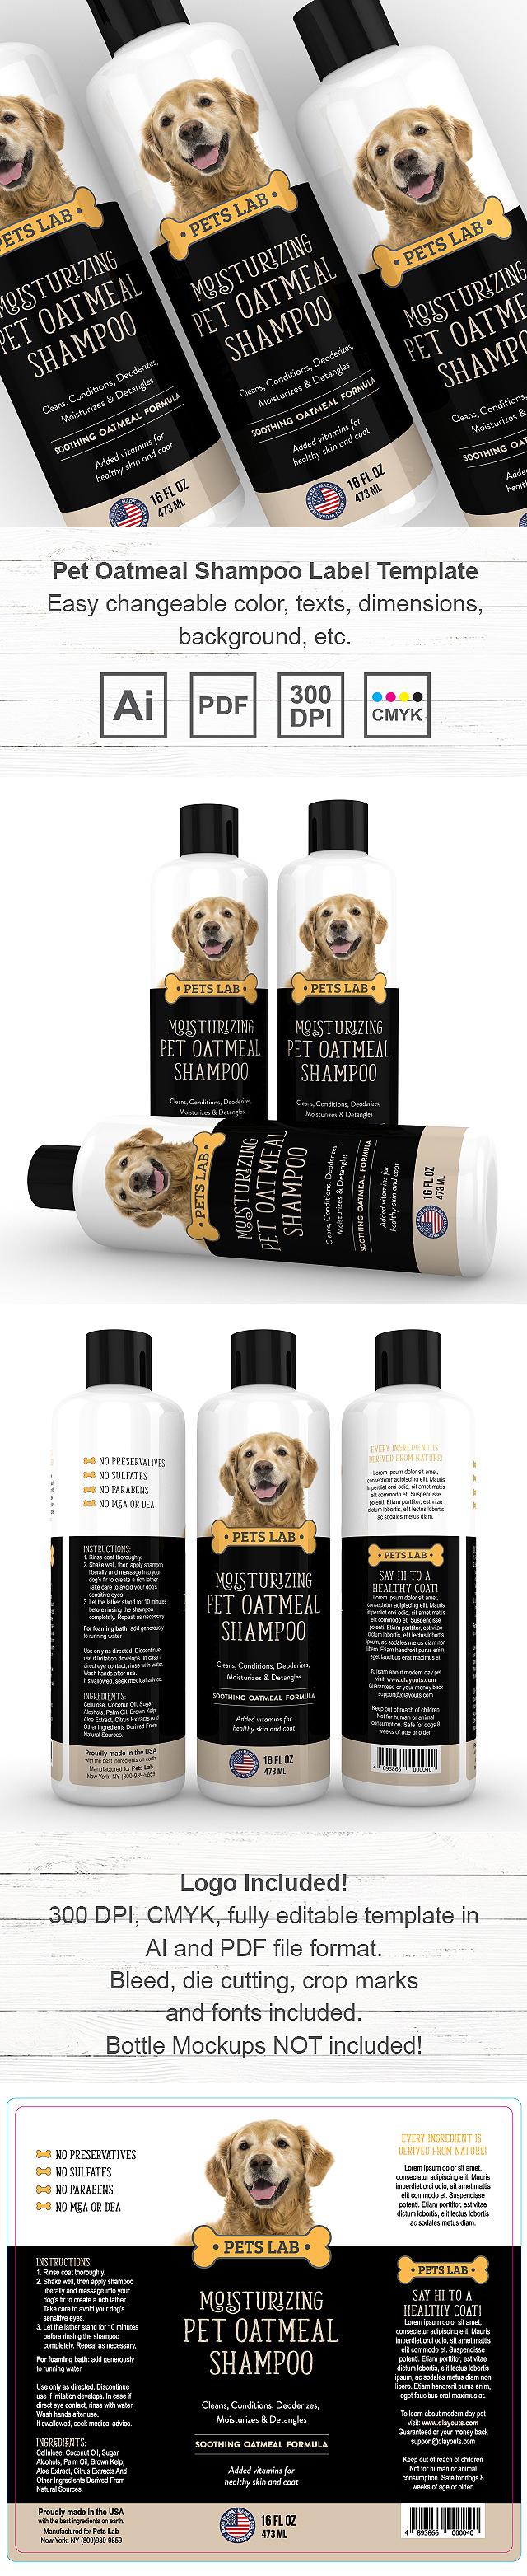 Pet Oatmeal Shampoo Label Template